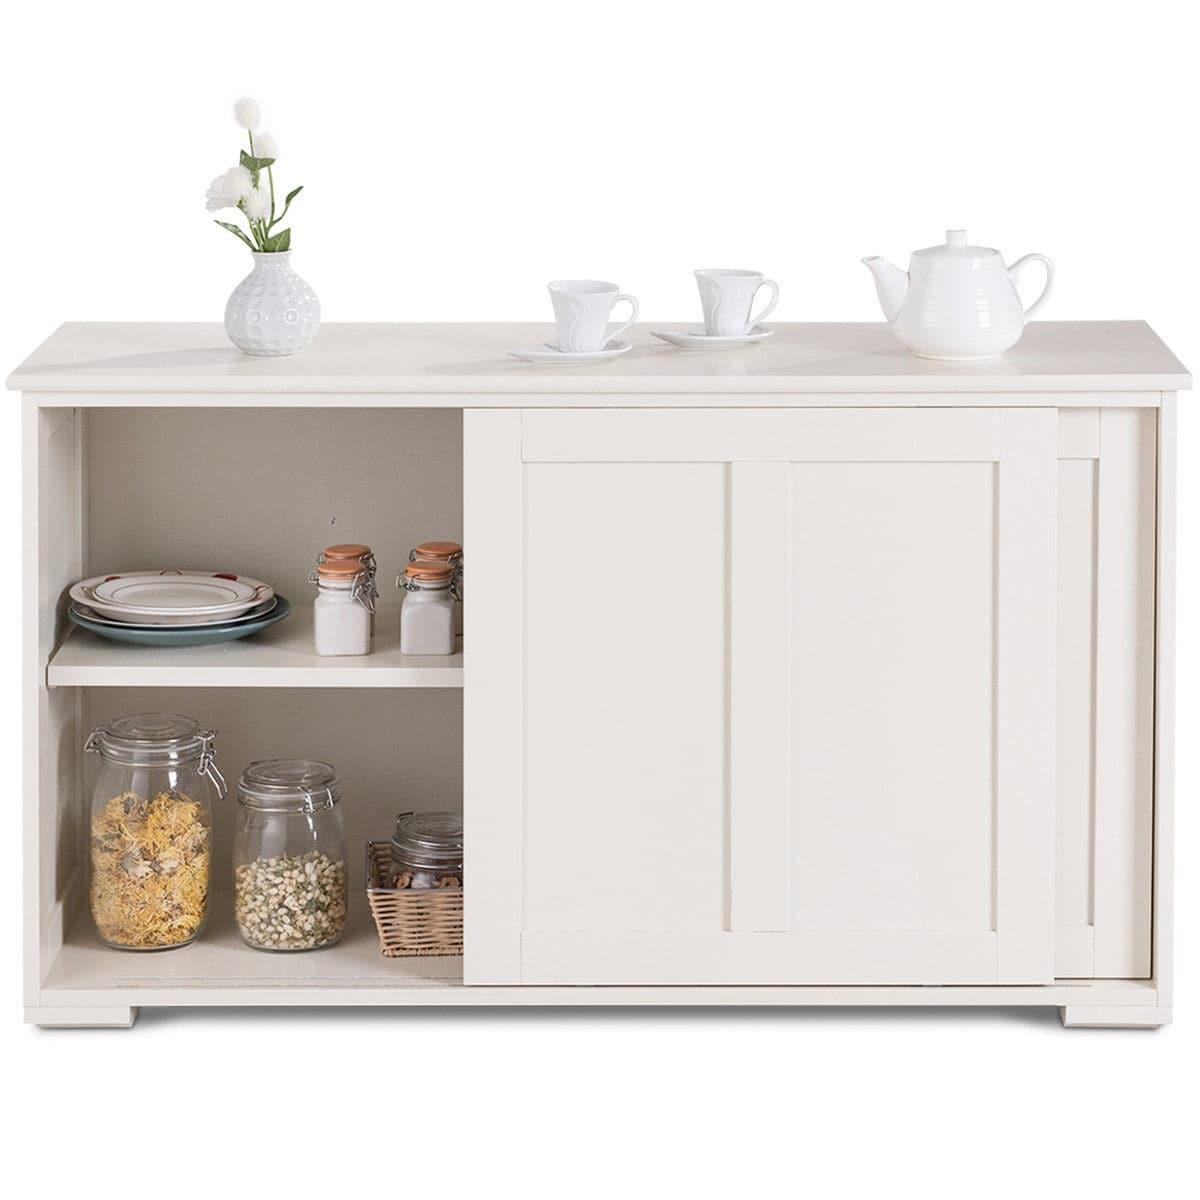 Costway Kitchen Storage Cabinet Sideboard Buffet Cupboard Wood Sliding Door Pantry